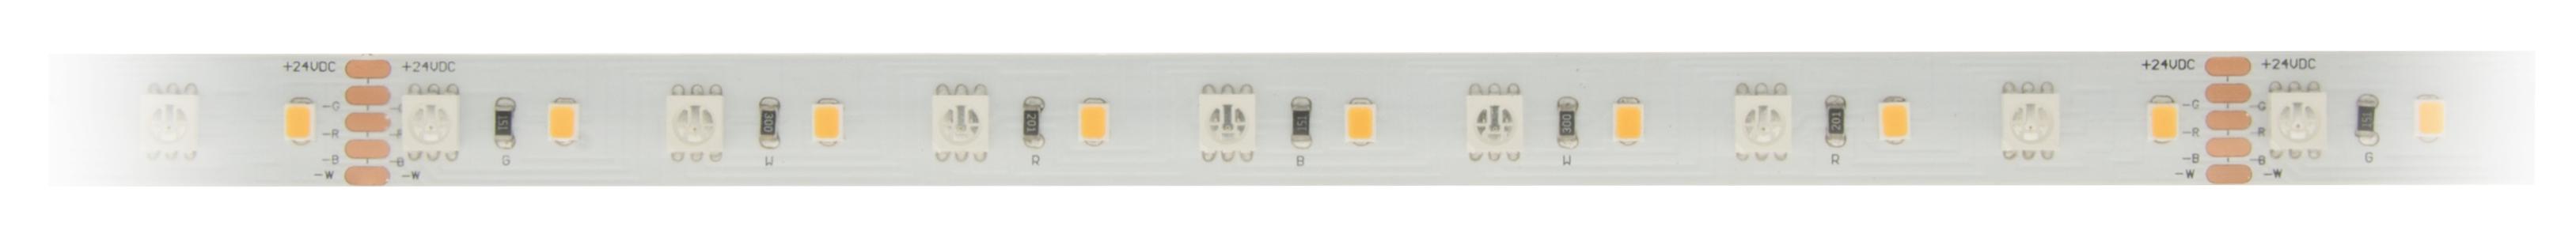 1 Stk Flexstrip 86 RGB HW Ra=90+ 10,7W/m 923lm/m 24VDC IP44, l=5m LIFS014010